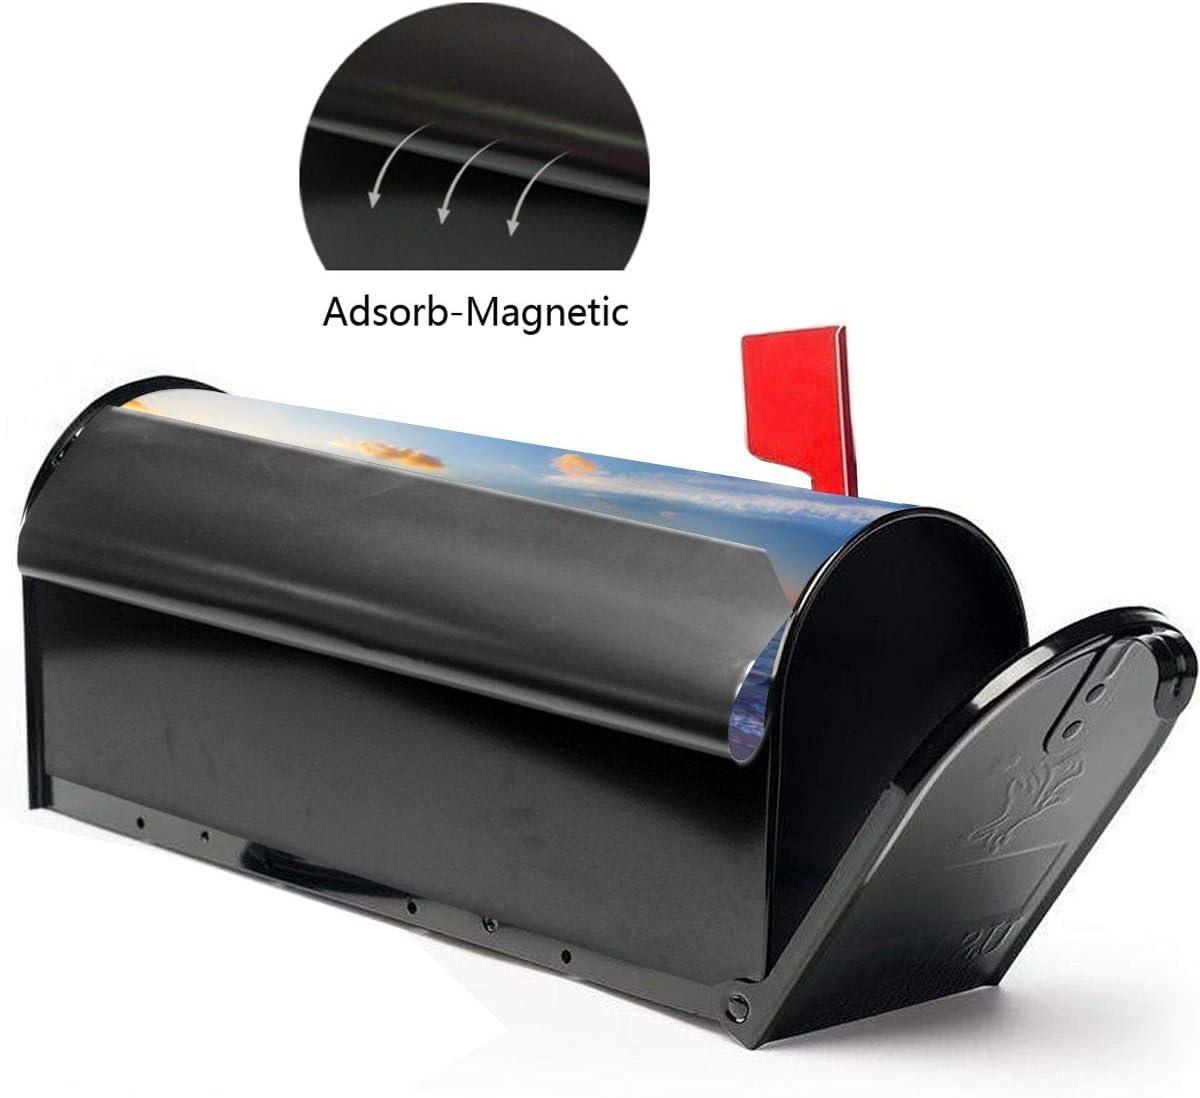 Mailbox Wraps Post Box for Garden Yard Outside Farmhouse Home Decor 21x18 Dadidyc Magnetic Size Mailbox Cover Beach Sea View